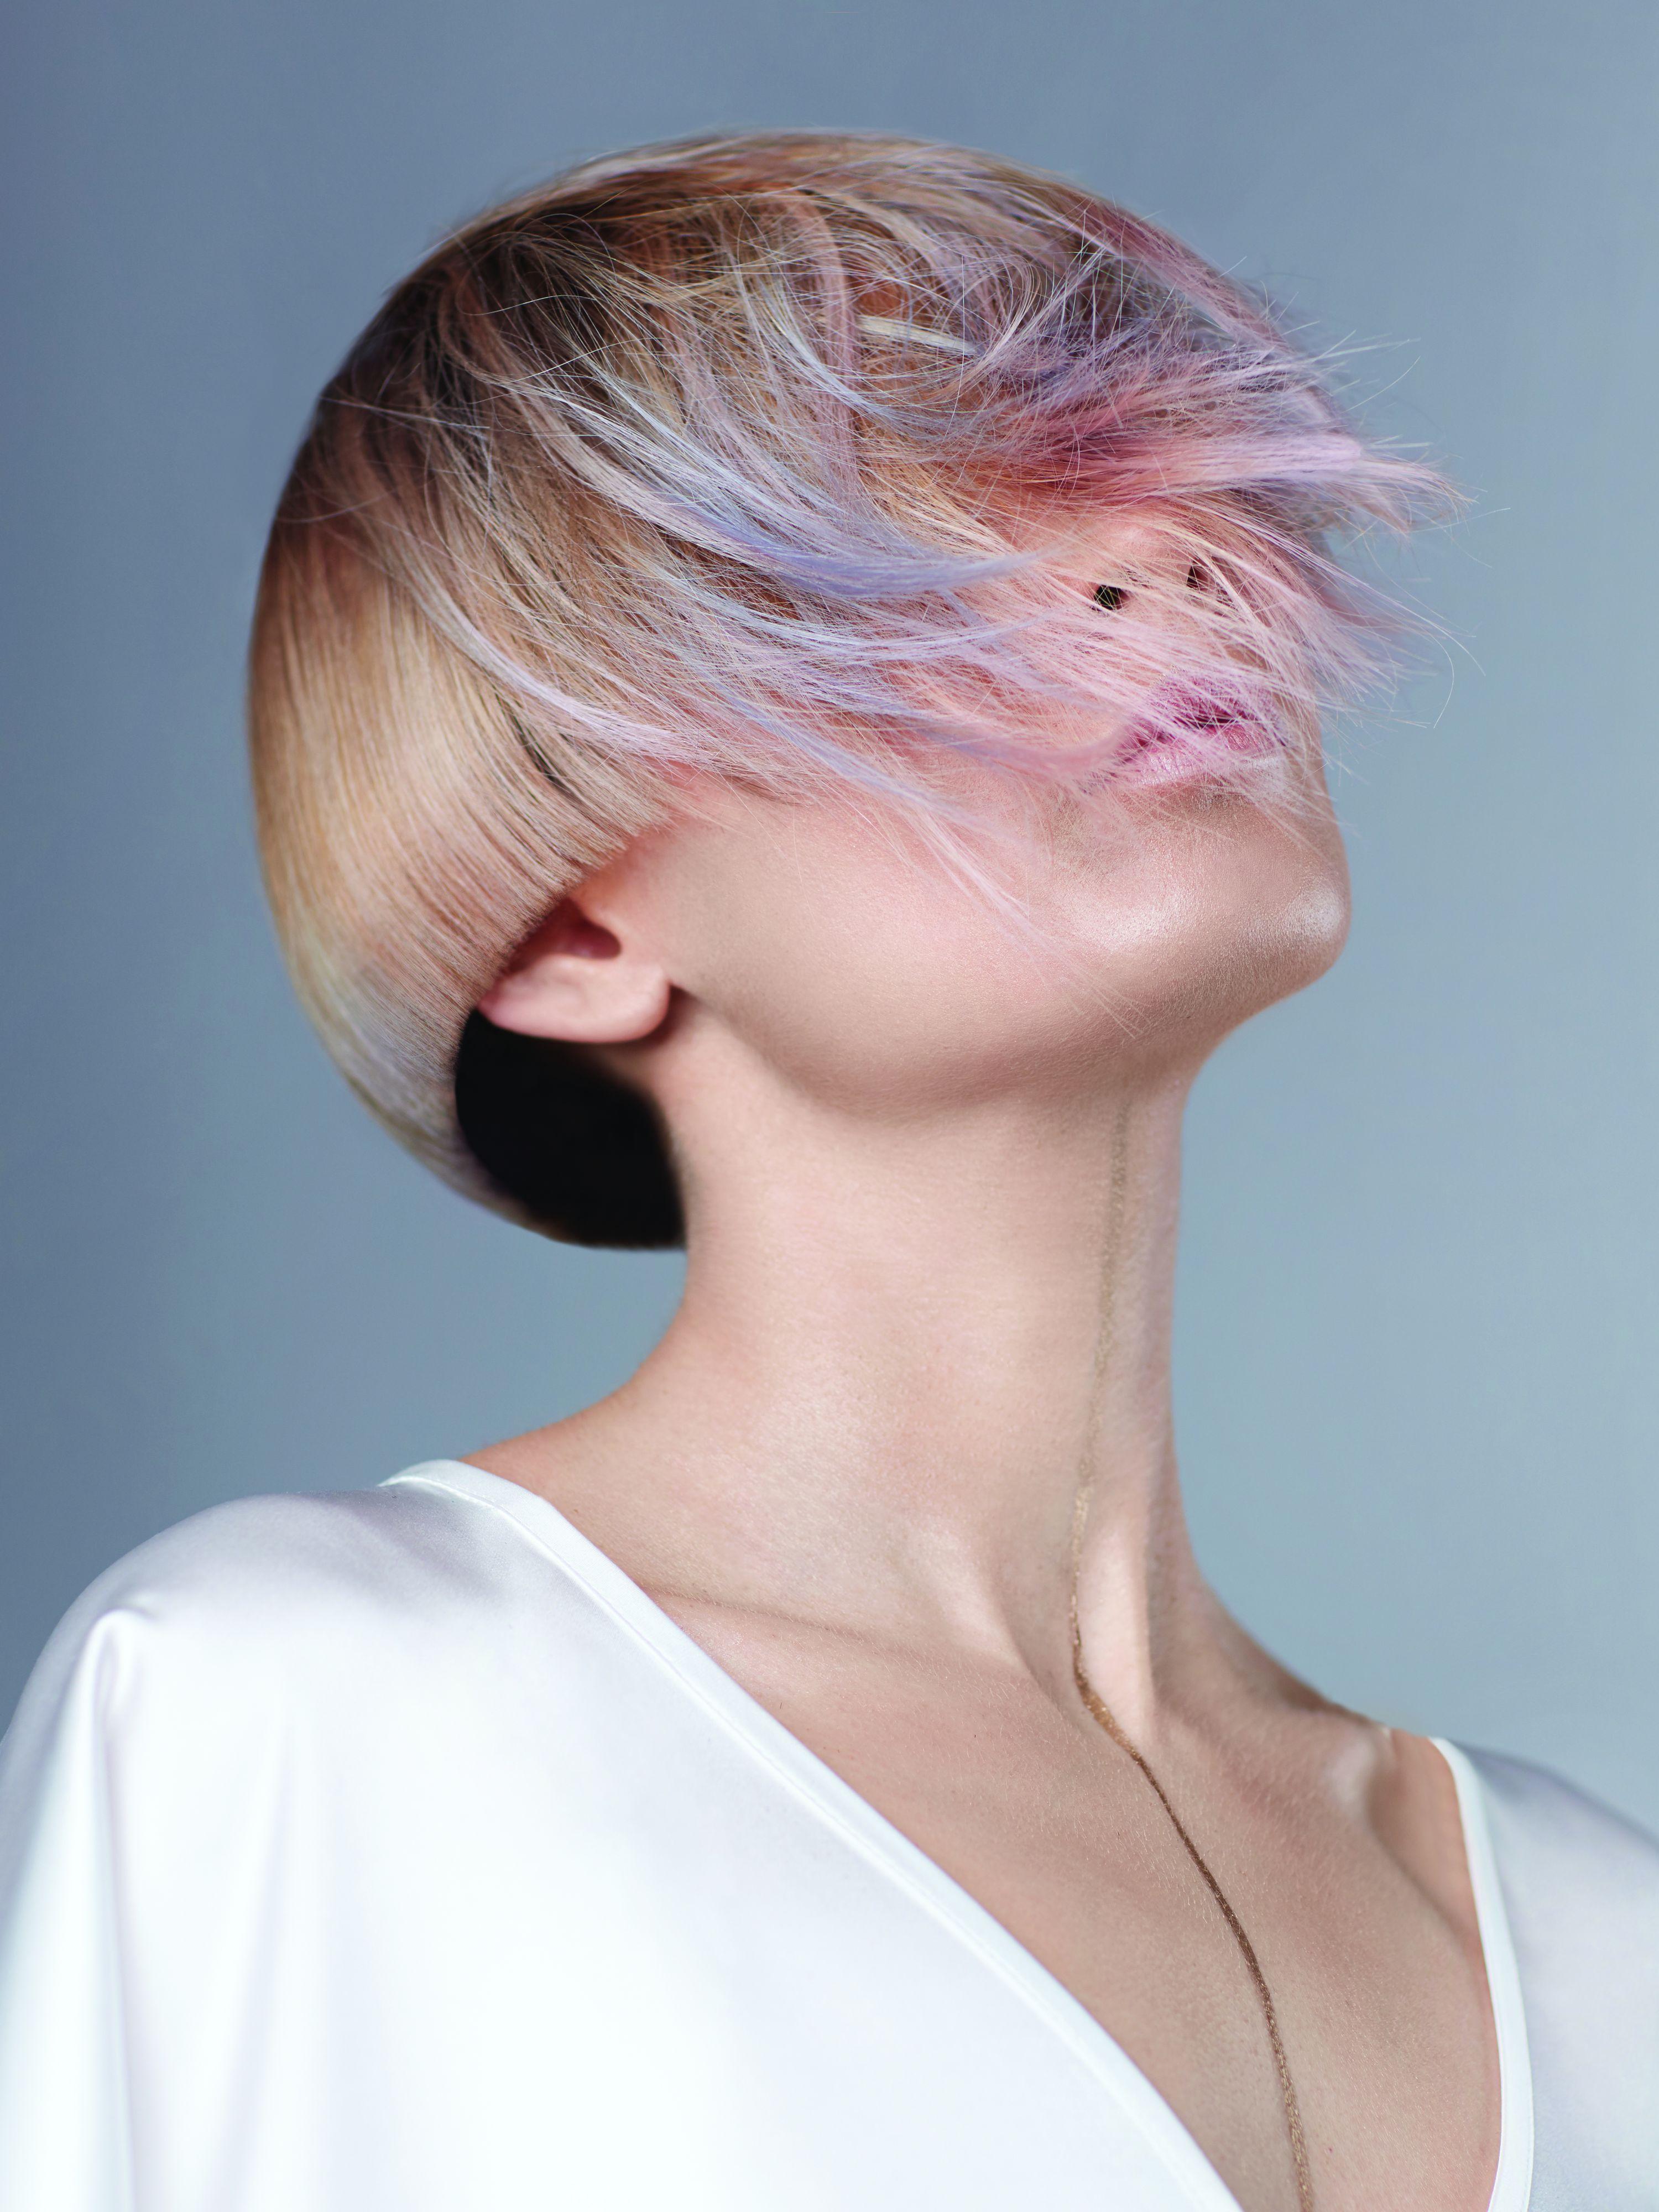 L Oreal Professionnel Purete Loreal Danielgryszke Hairstyle Haircut Haircolor Style Okrashivanie Kolorirovanie Volo Pricheski Volosy Korotkie Pricheski